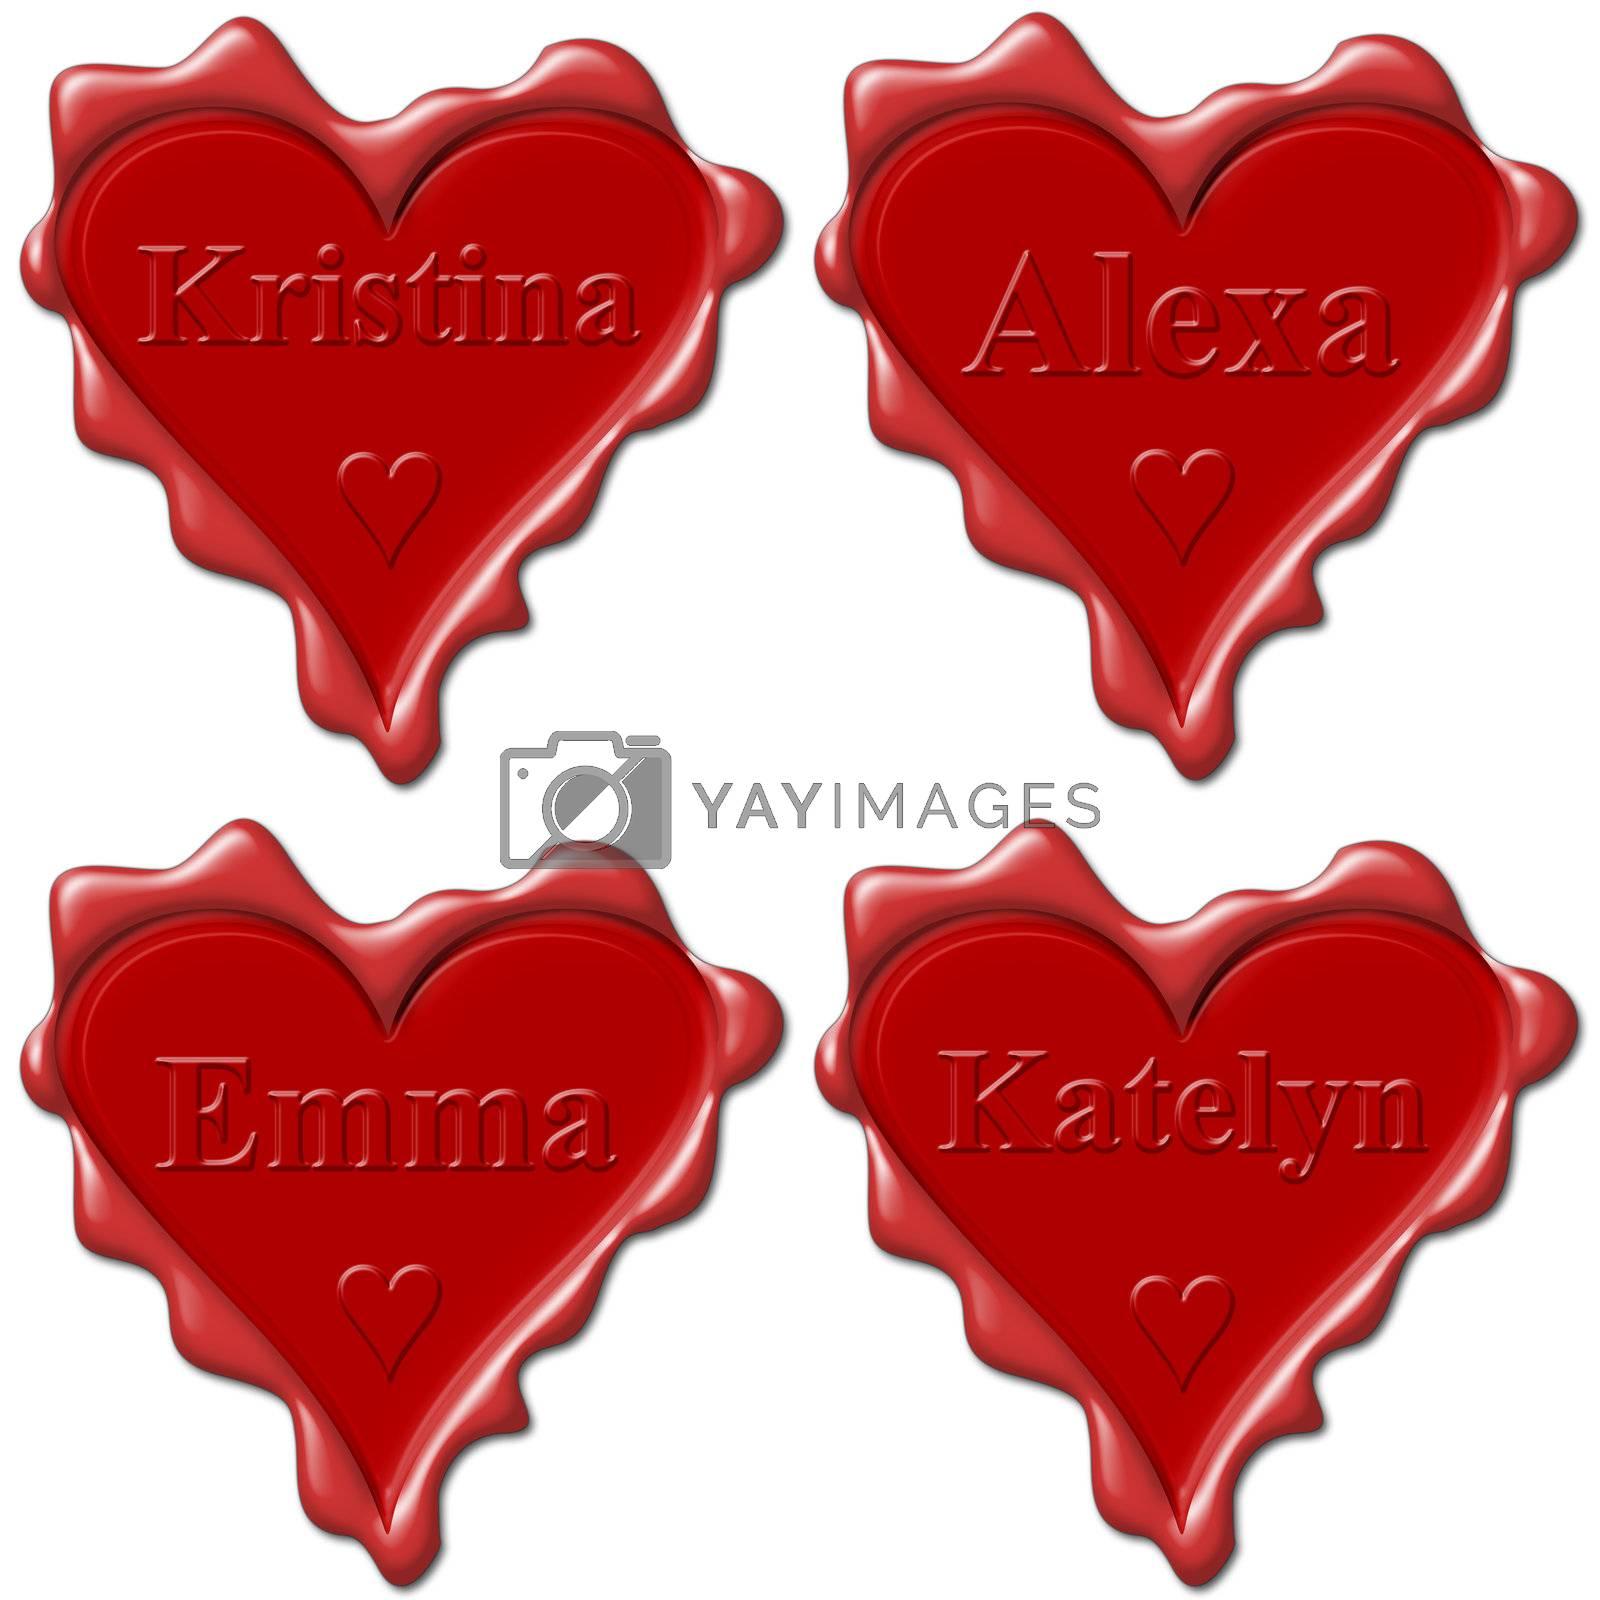 Valentine love hearts with names: Kristina, Alexa, Emma, Katelyn